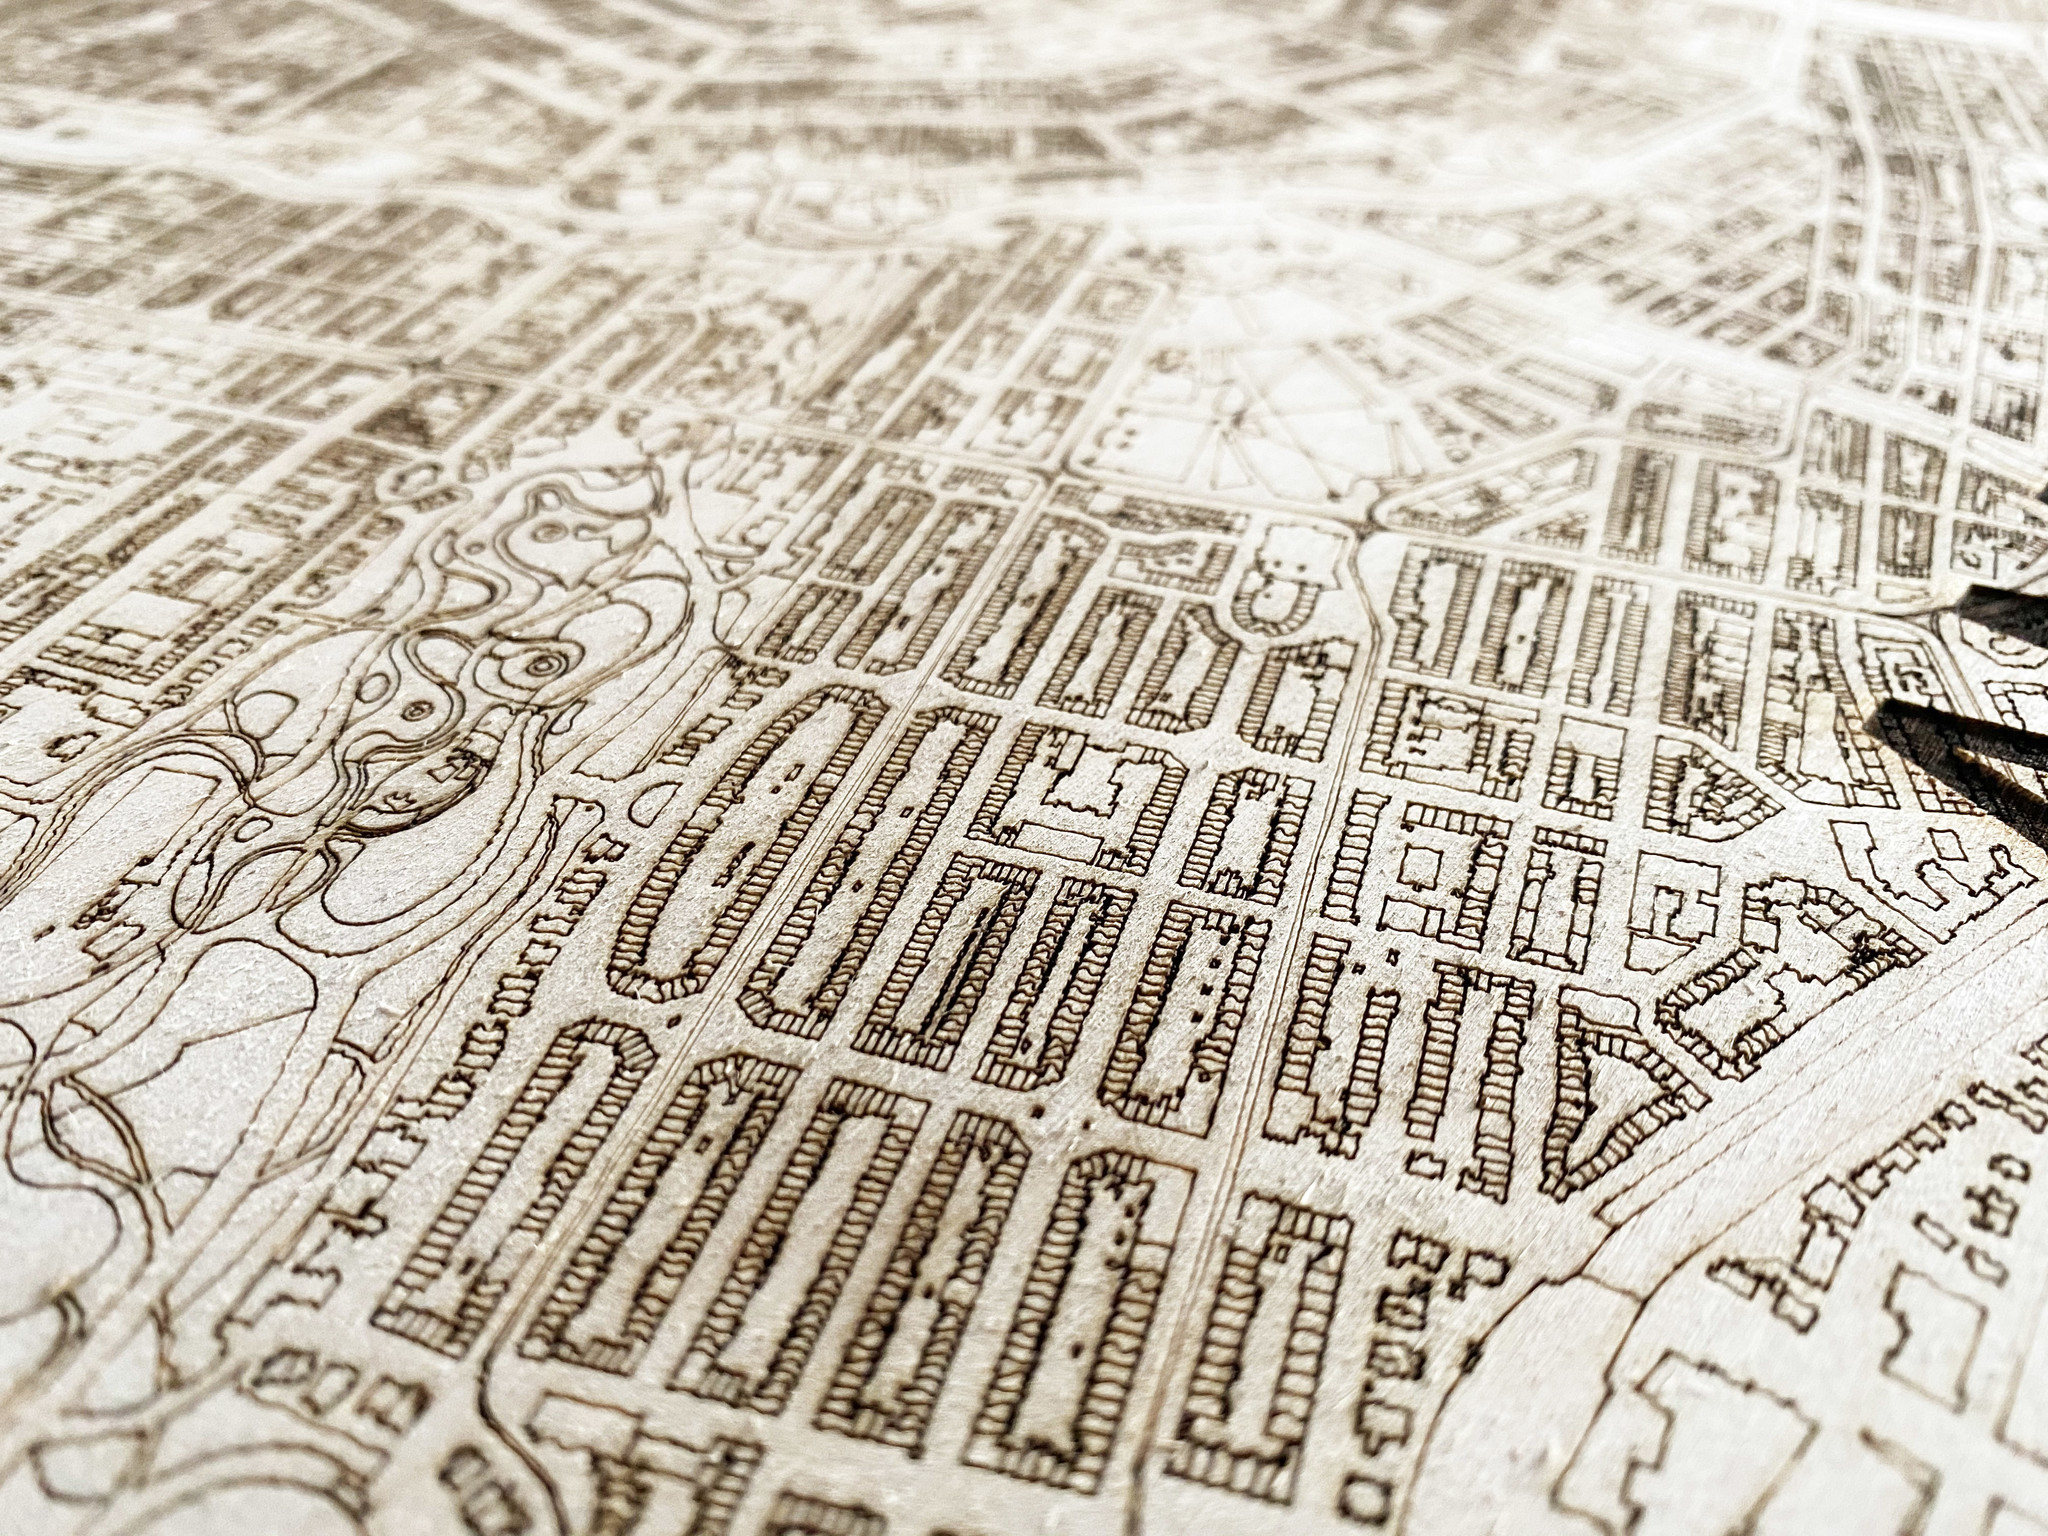 Houten stadsplattegrond Lelystad-2